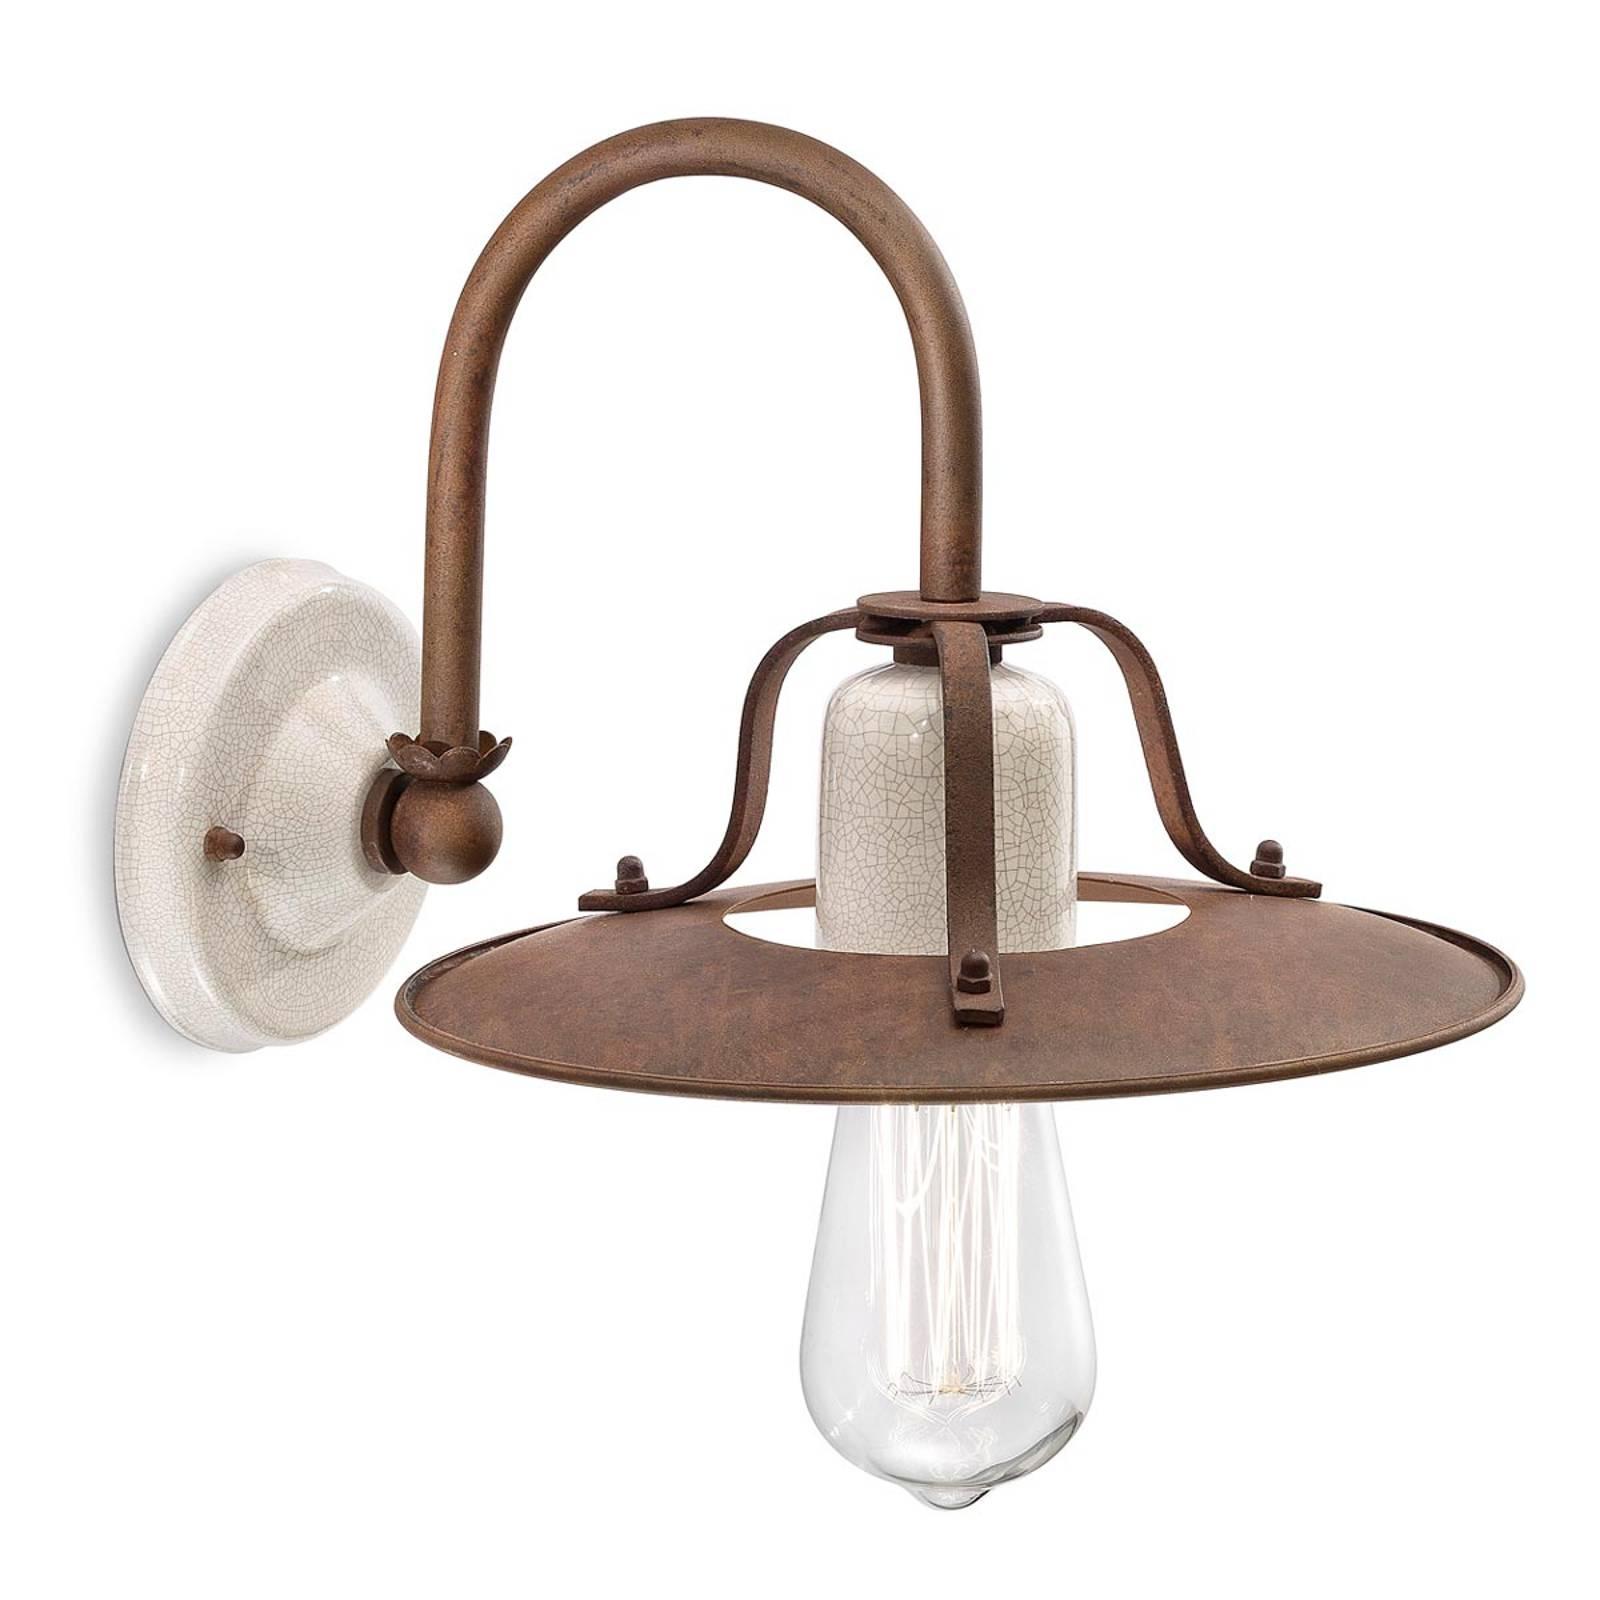 Rustieke wandlamp Riccardo met witte keramiek